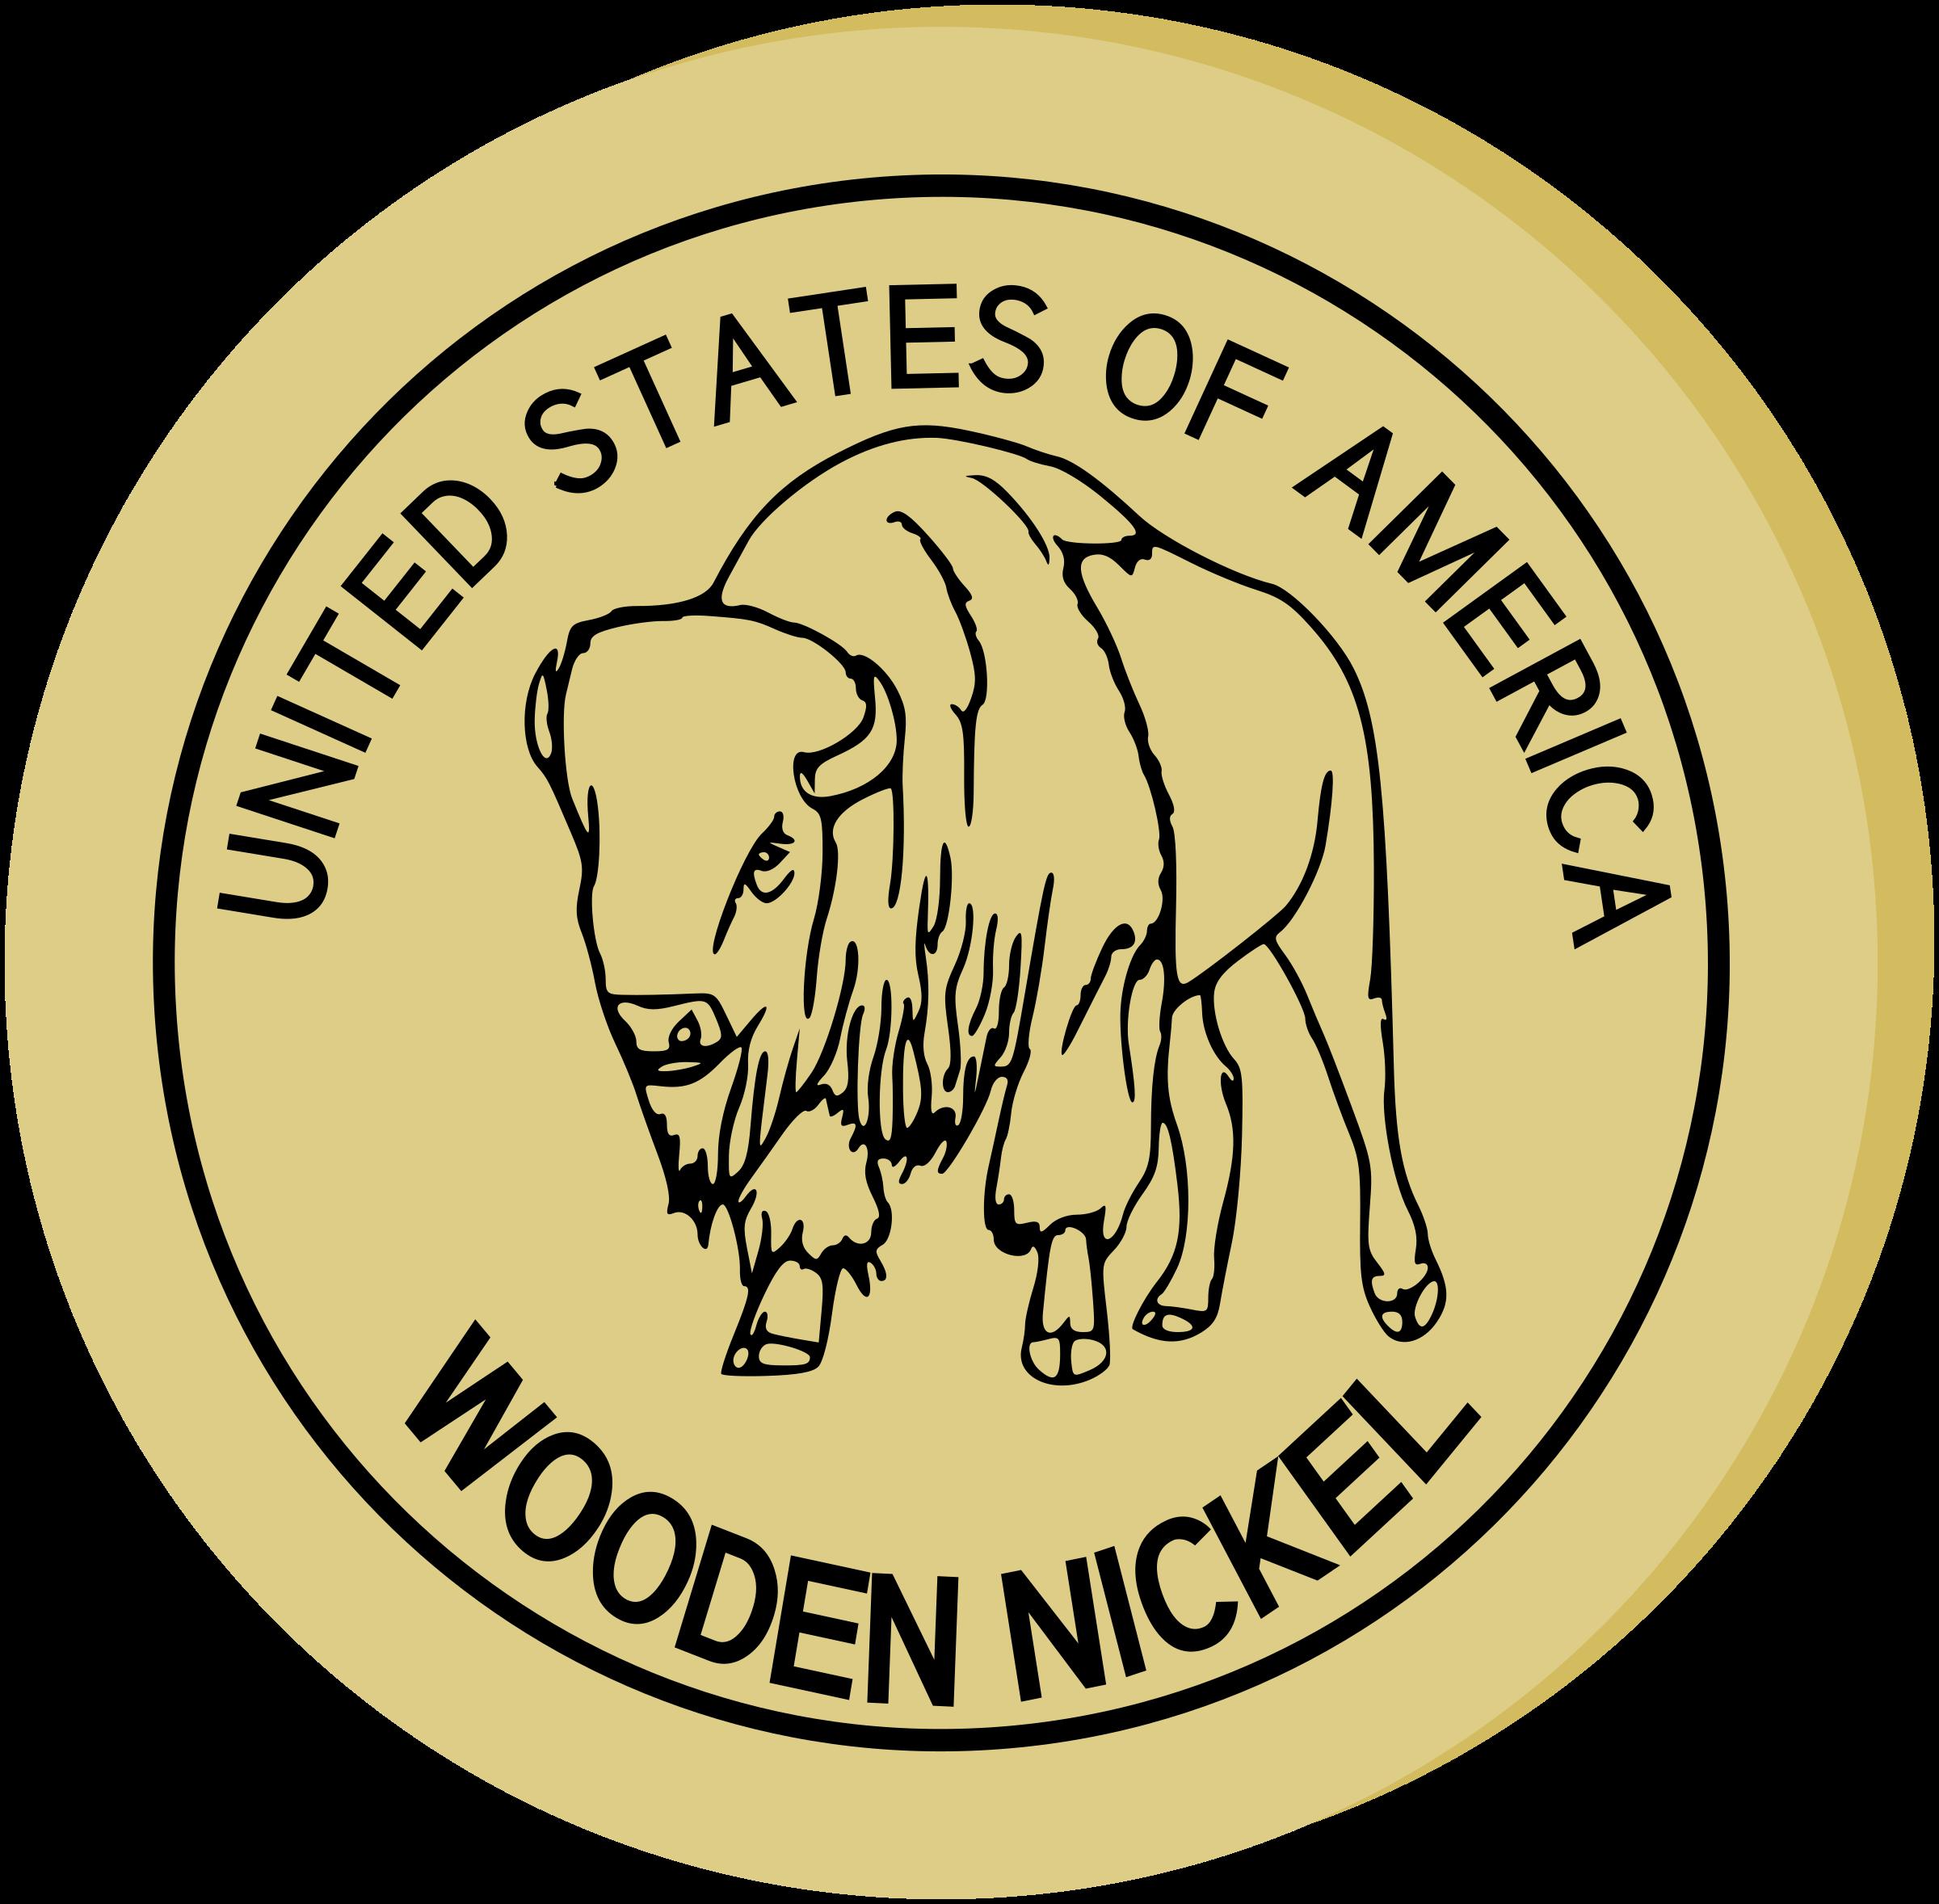 Nickel clipart nickel coin. Wooden big image png